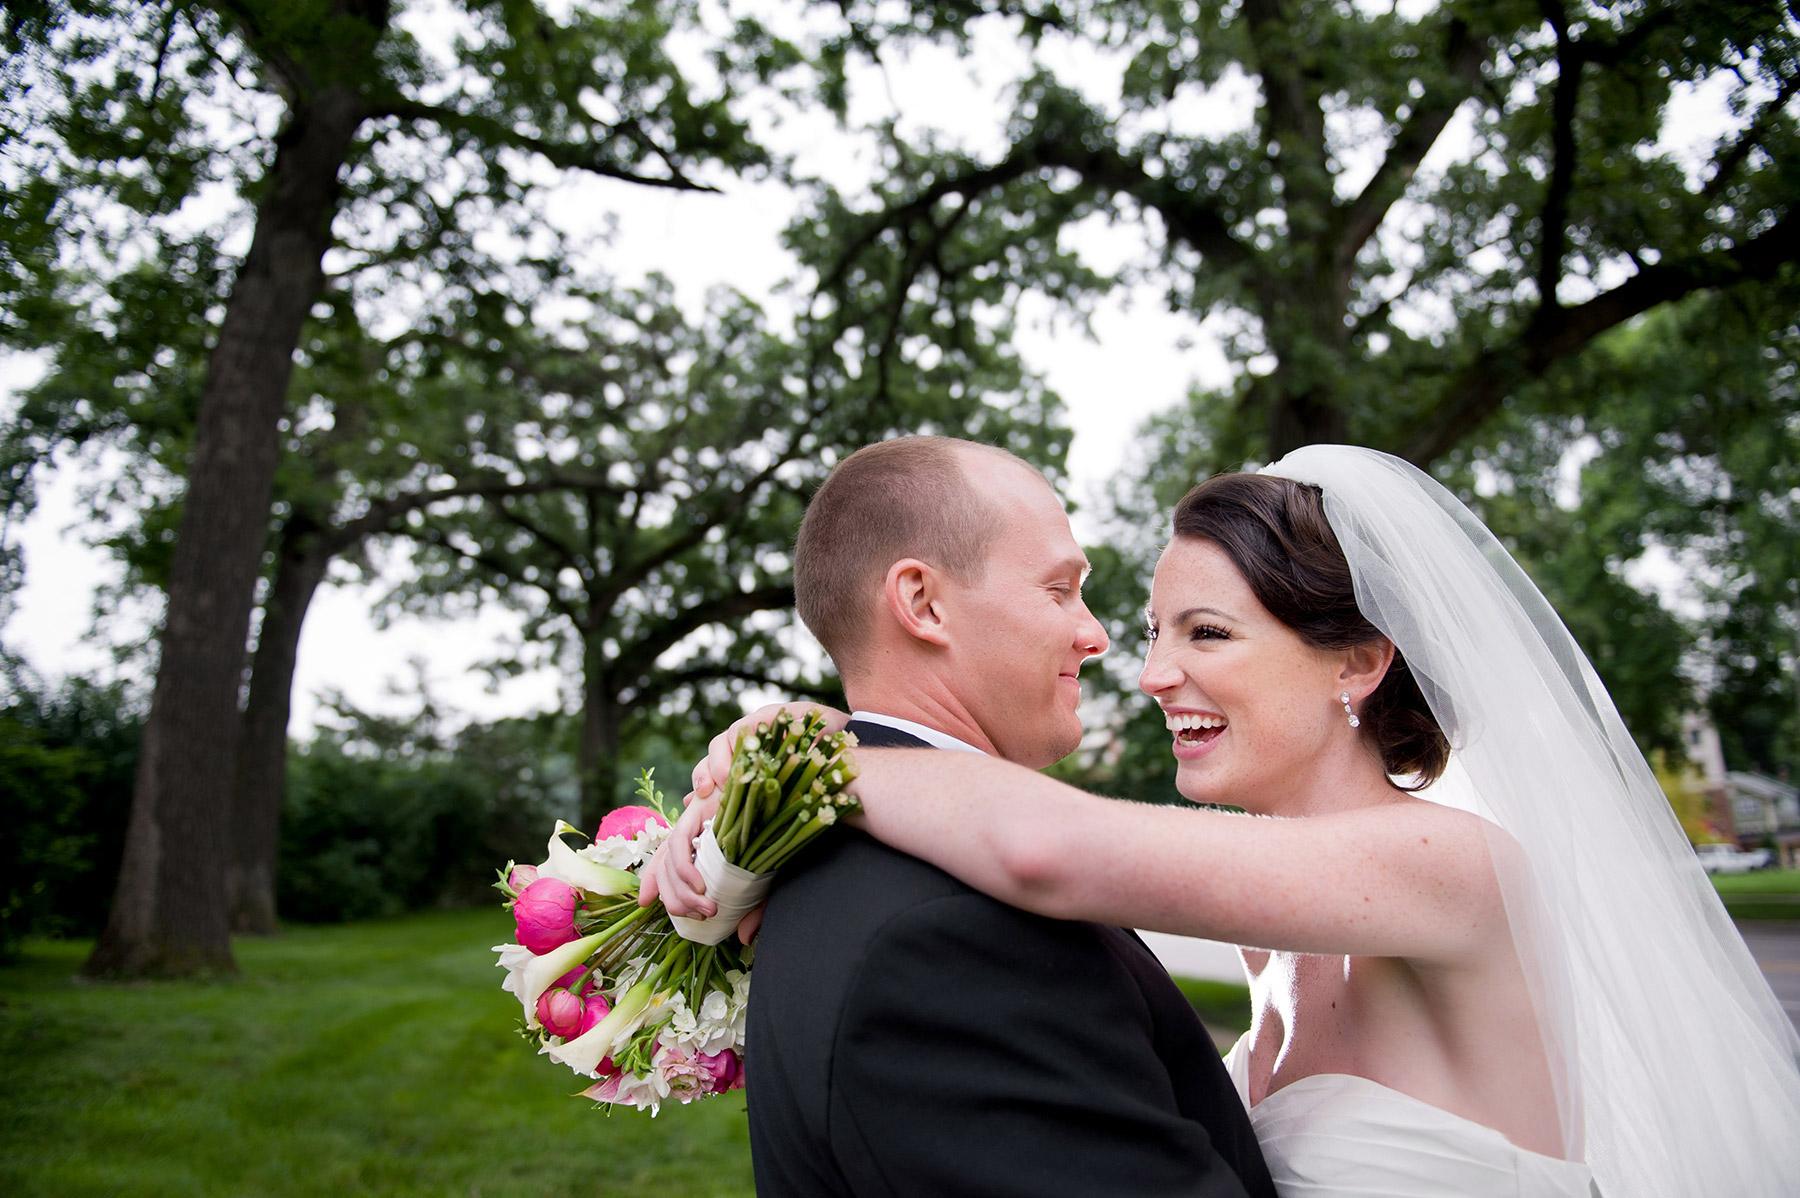 minnesota-wedding-photographers-mark-kegans-960.jpg